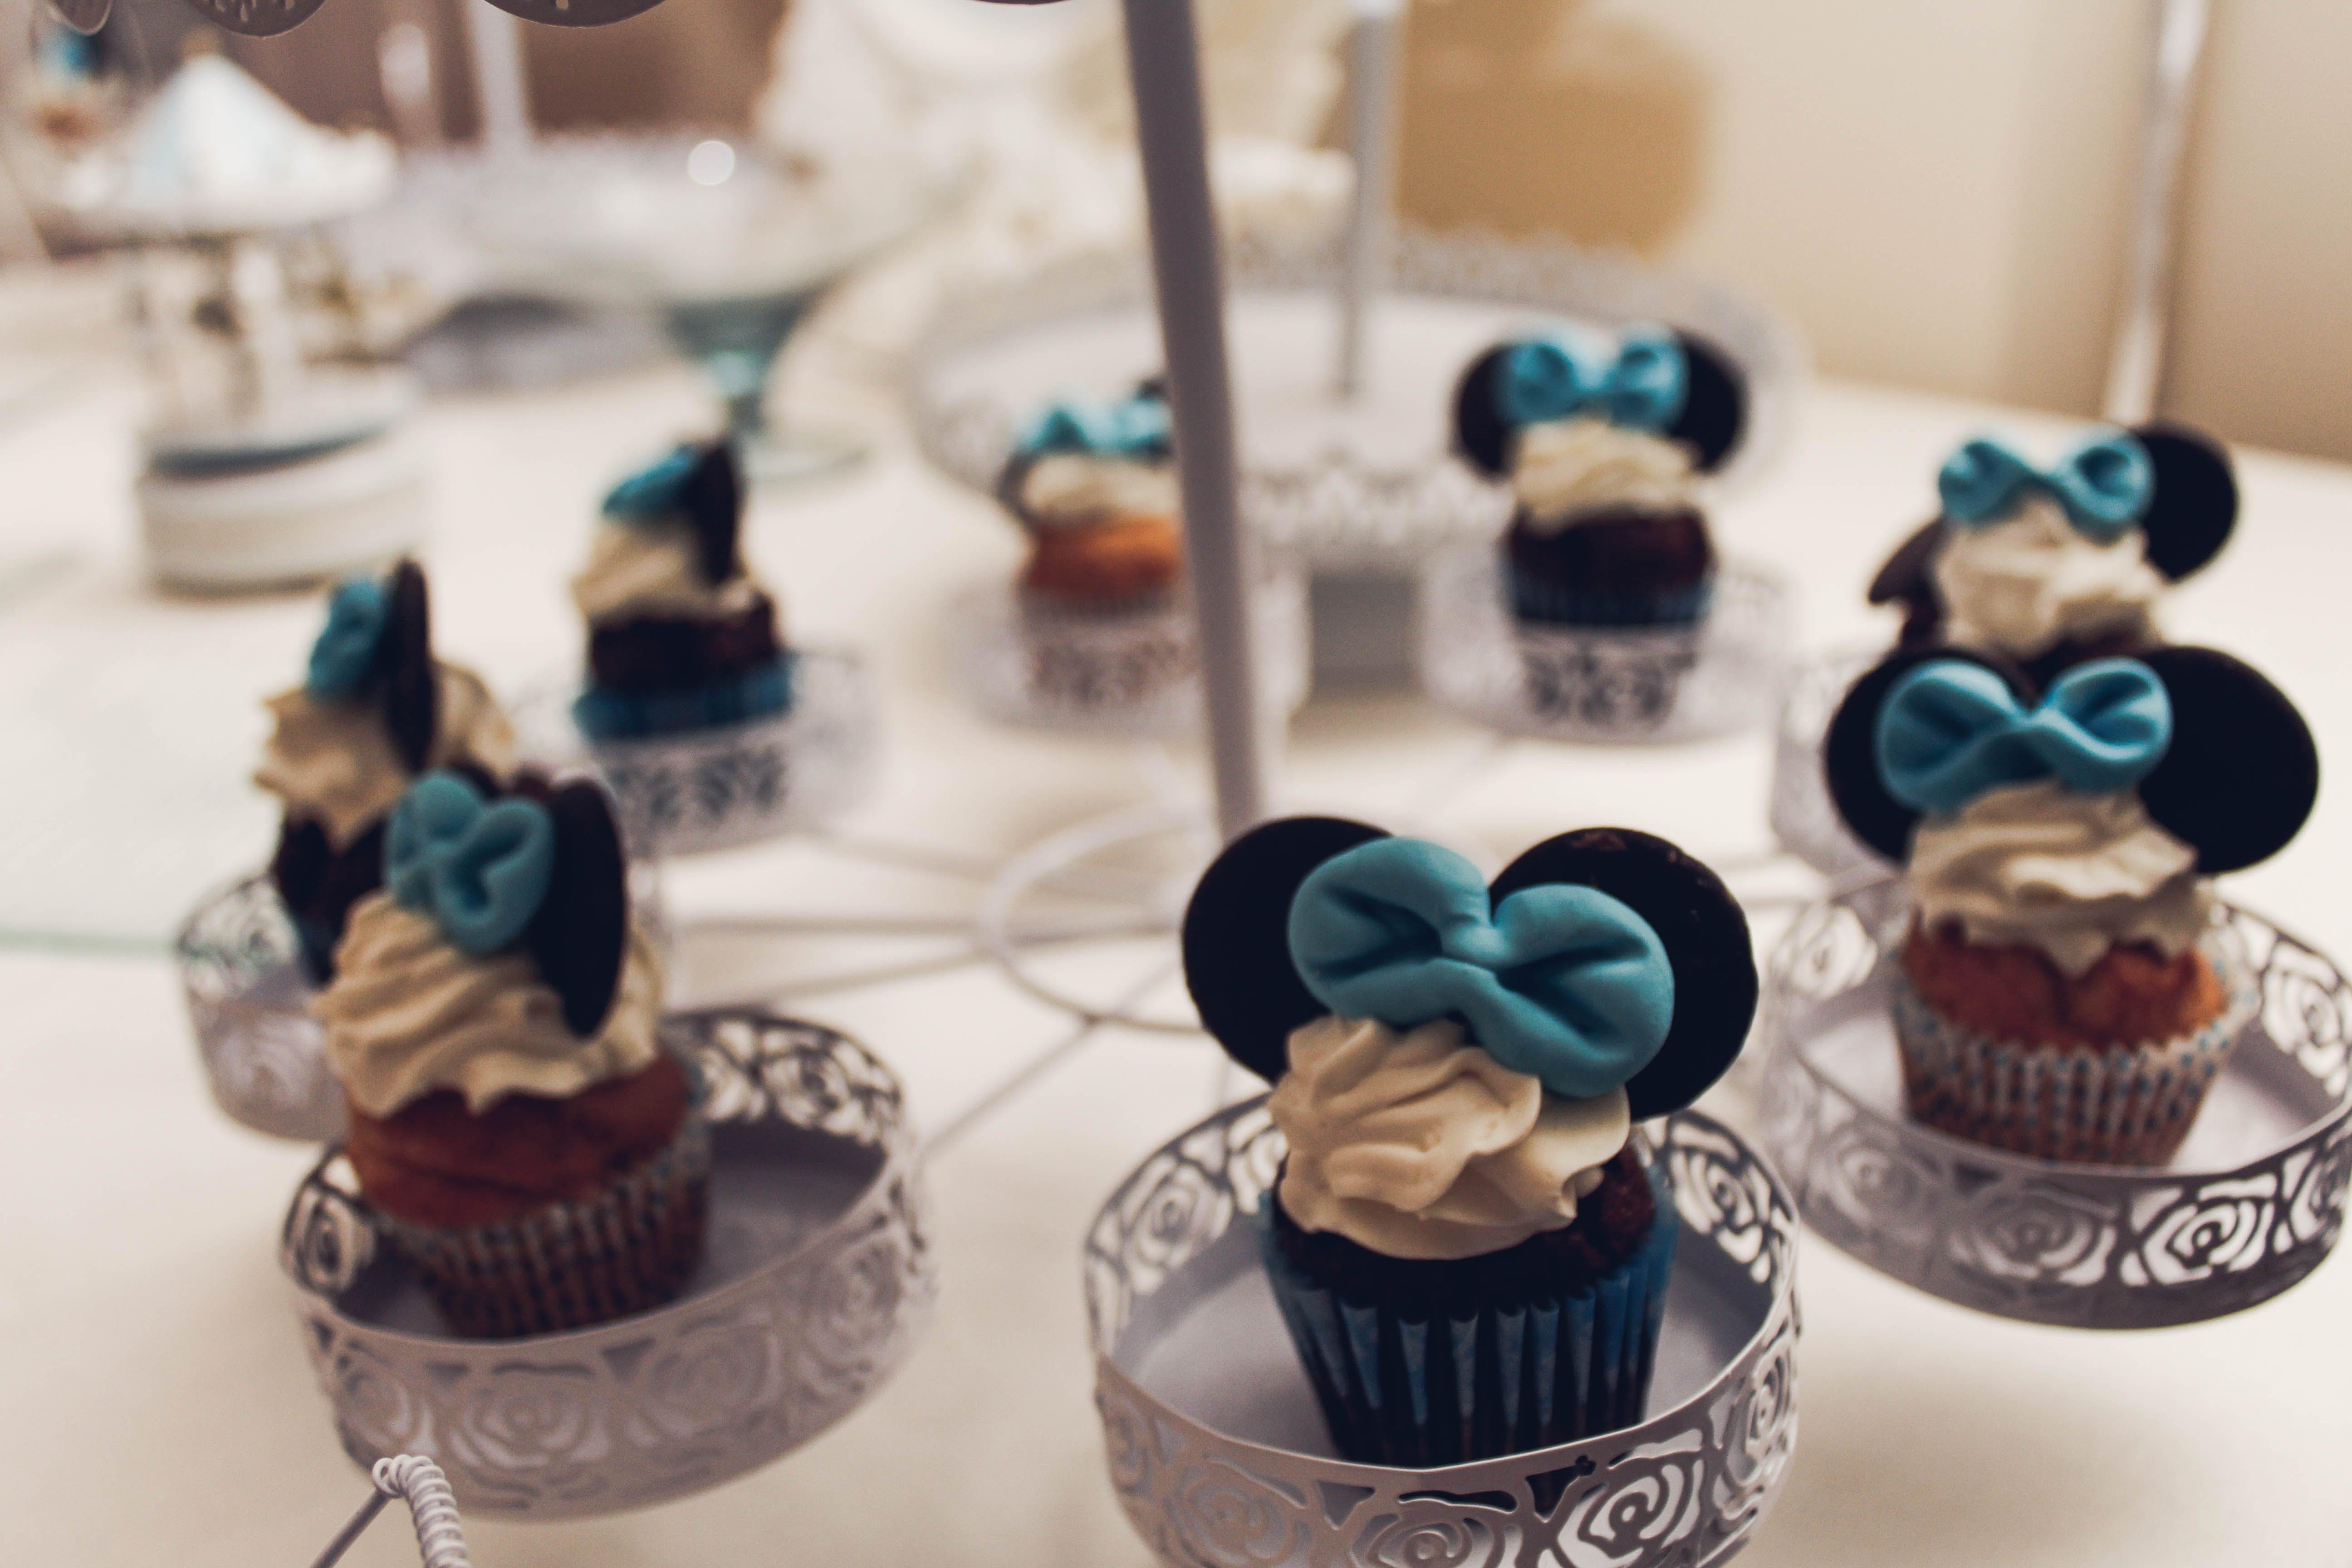 Free stock photo of birthday cake, buffet, cake, candy